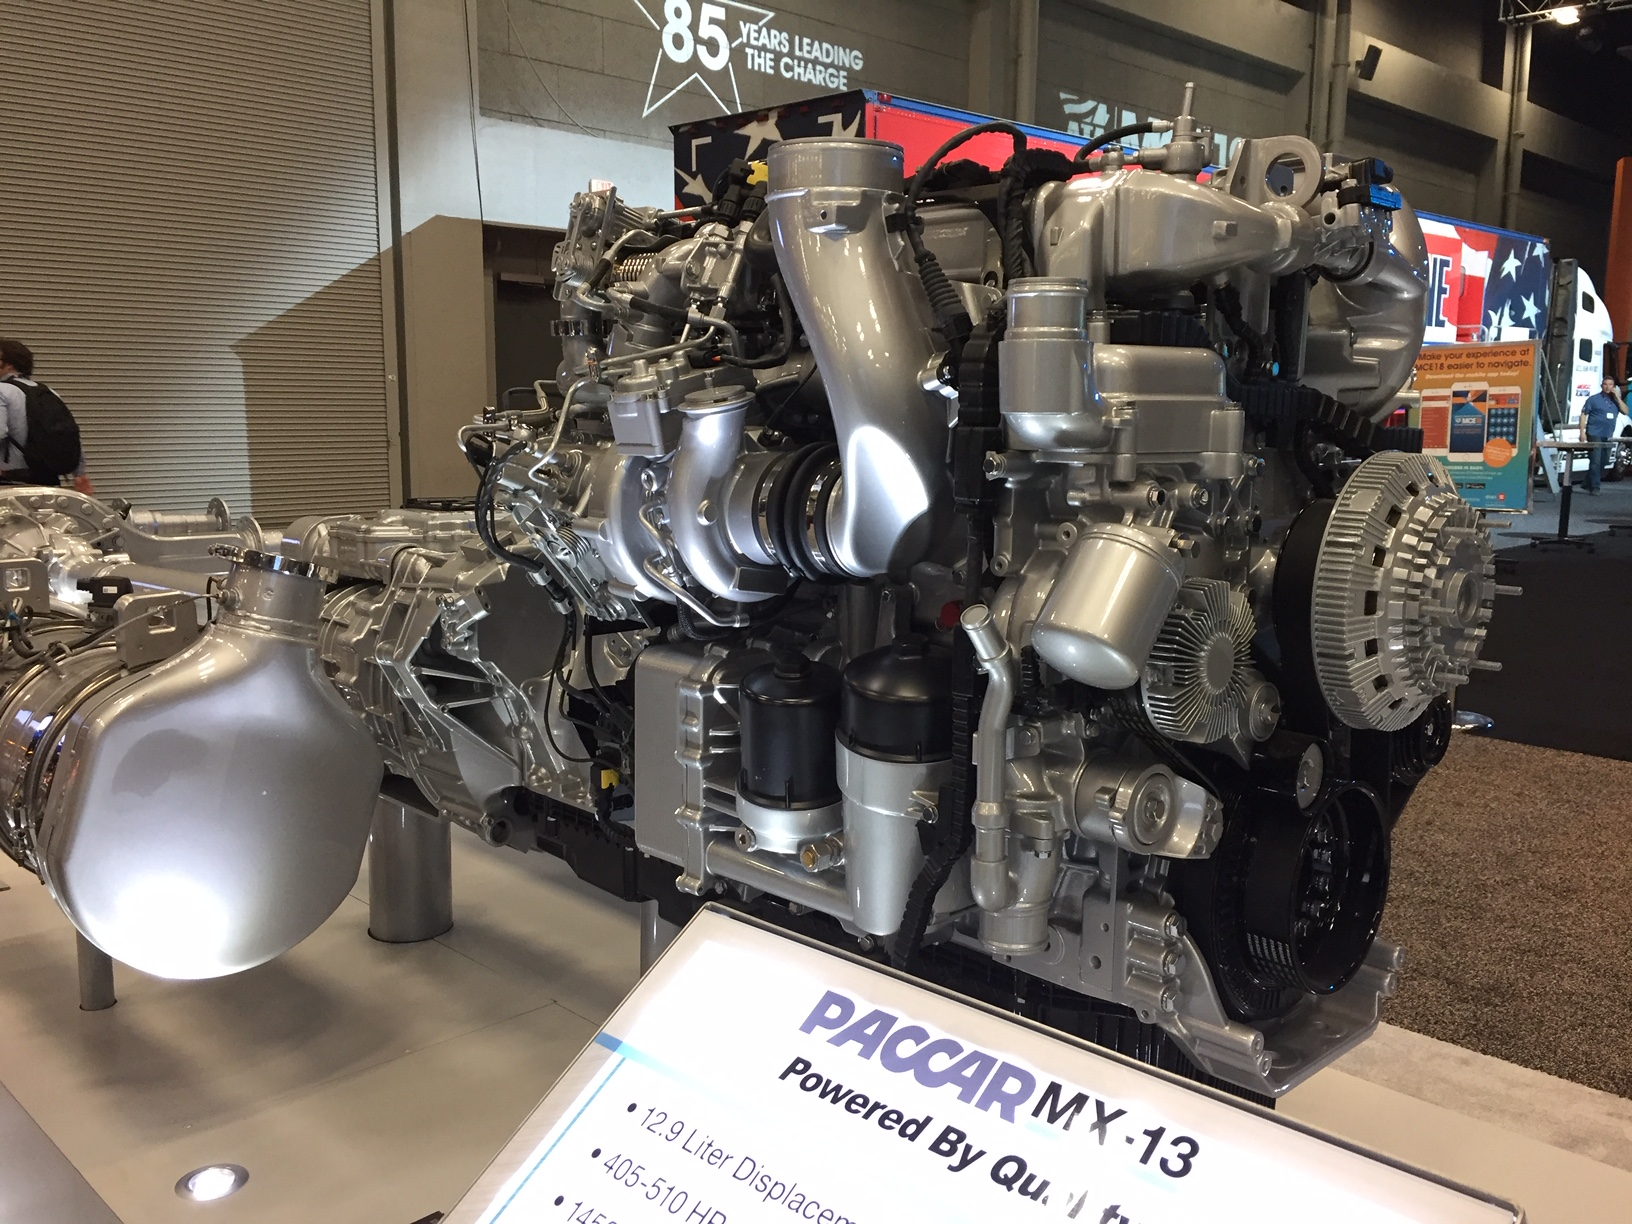 Peterbilt Details MX-13 Engine Option Upgrades - Equipment